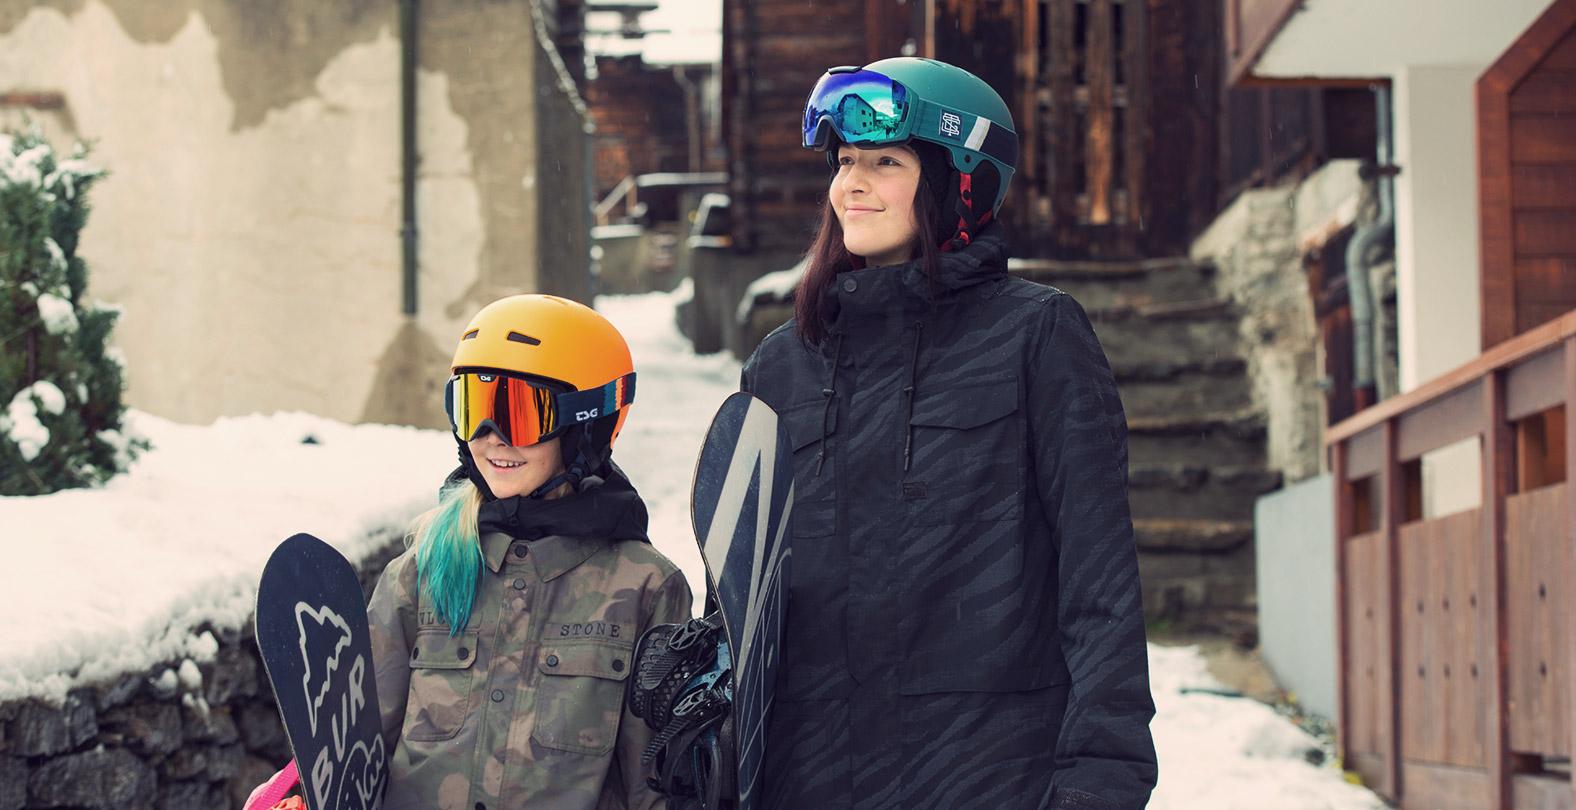 Leilani Ettel and Kona Ettel in Saas Fee photoshooting for TSG